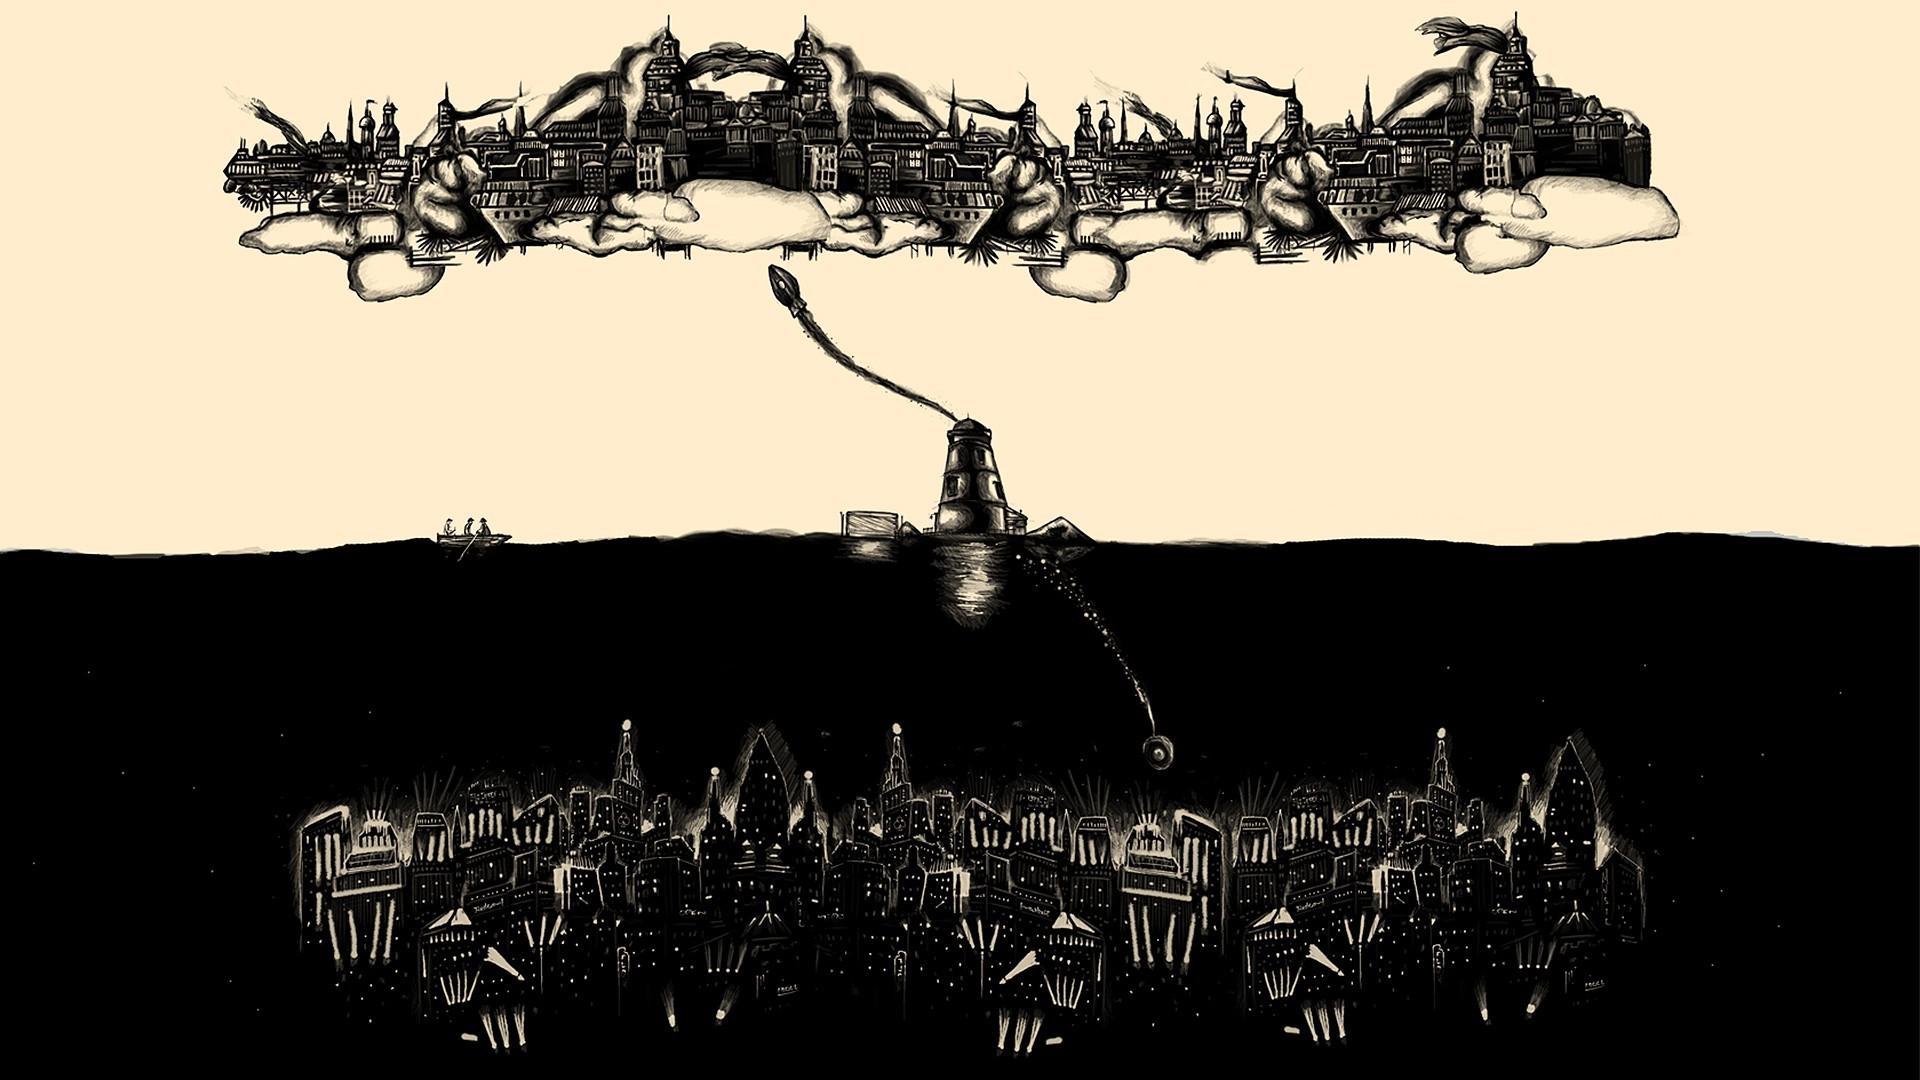 1920x1080 px anime Beacon BioShock BioShock Infinite Rapture